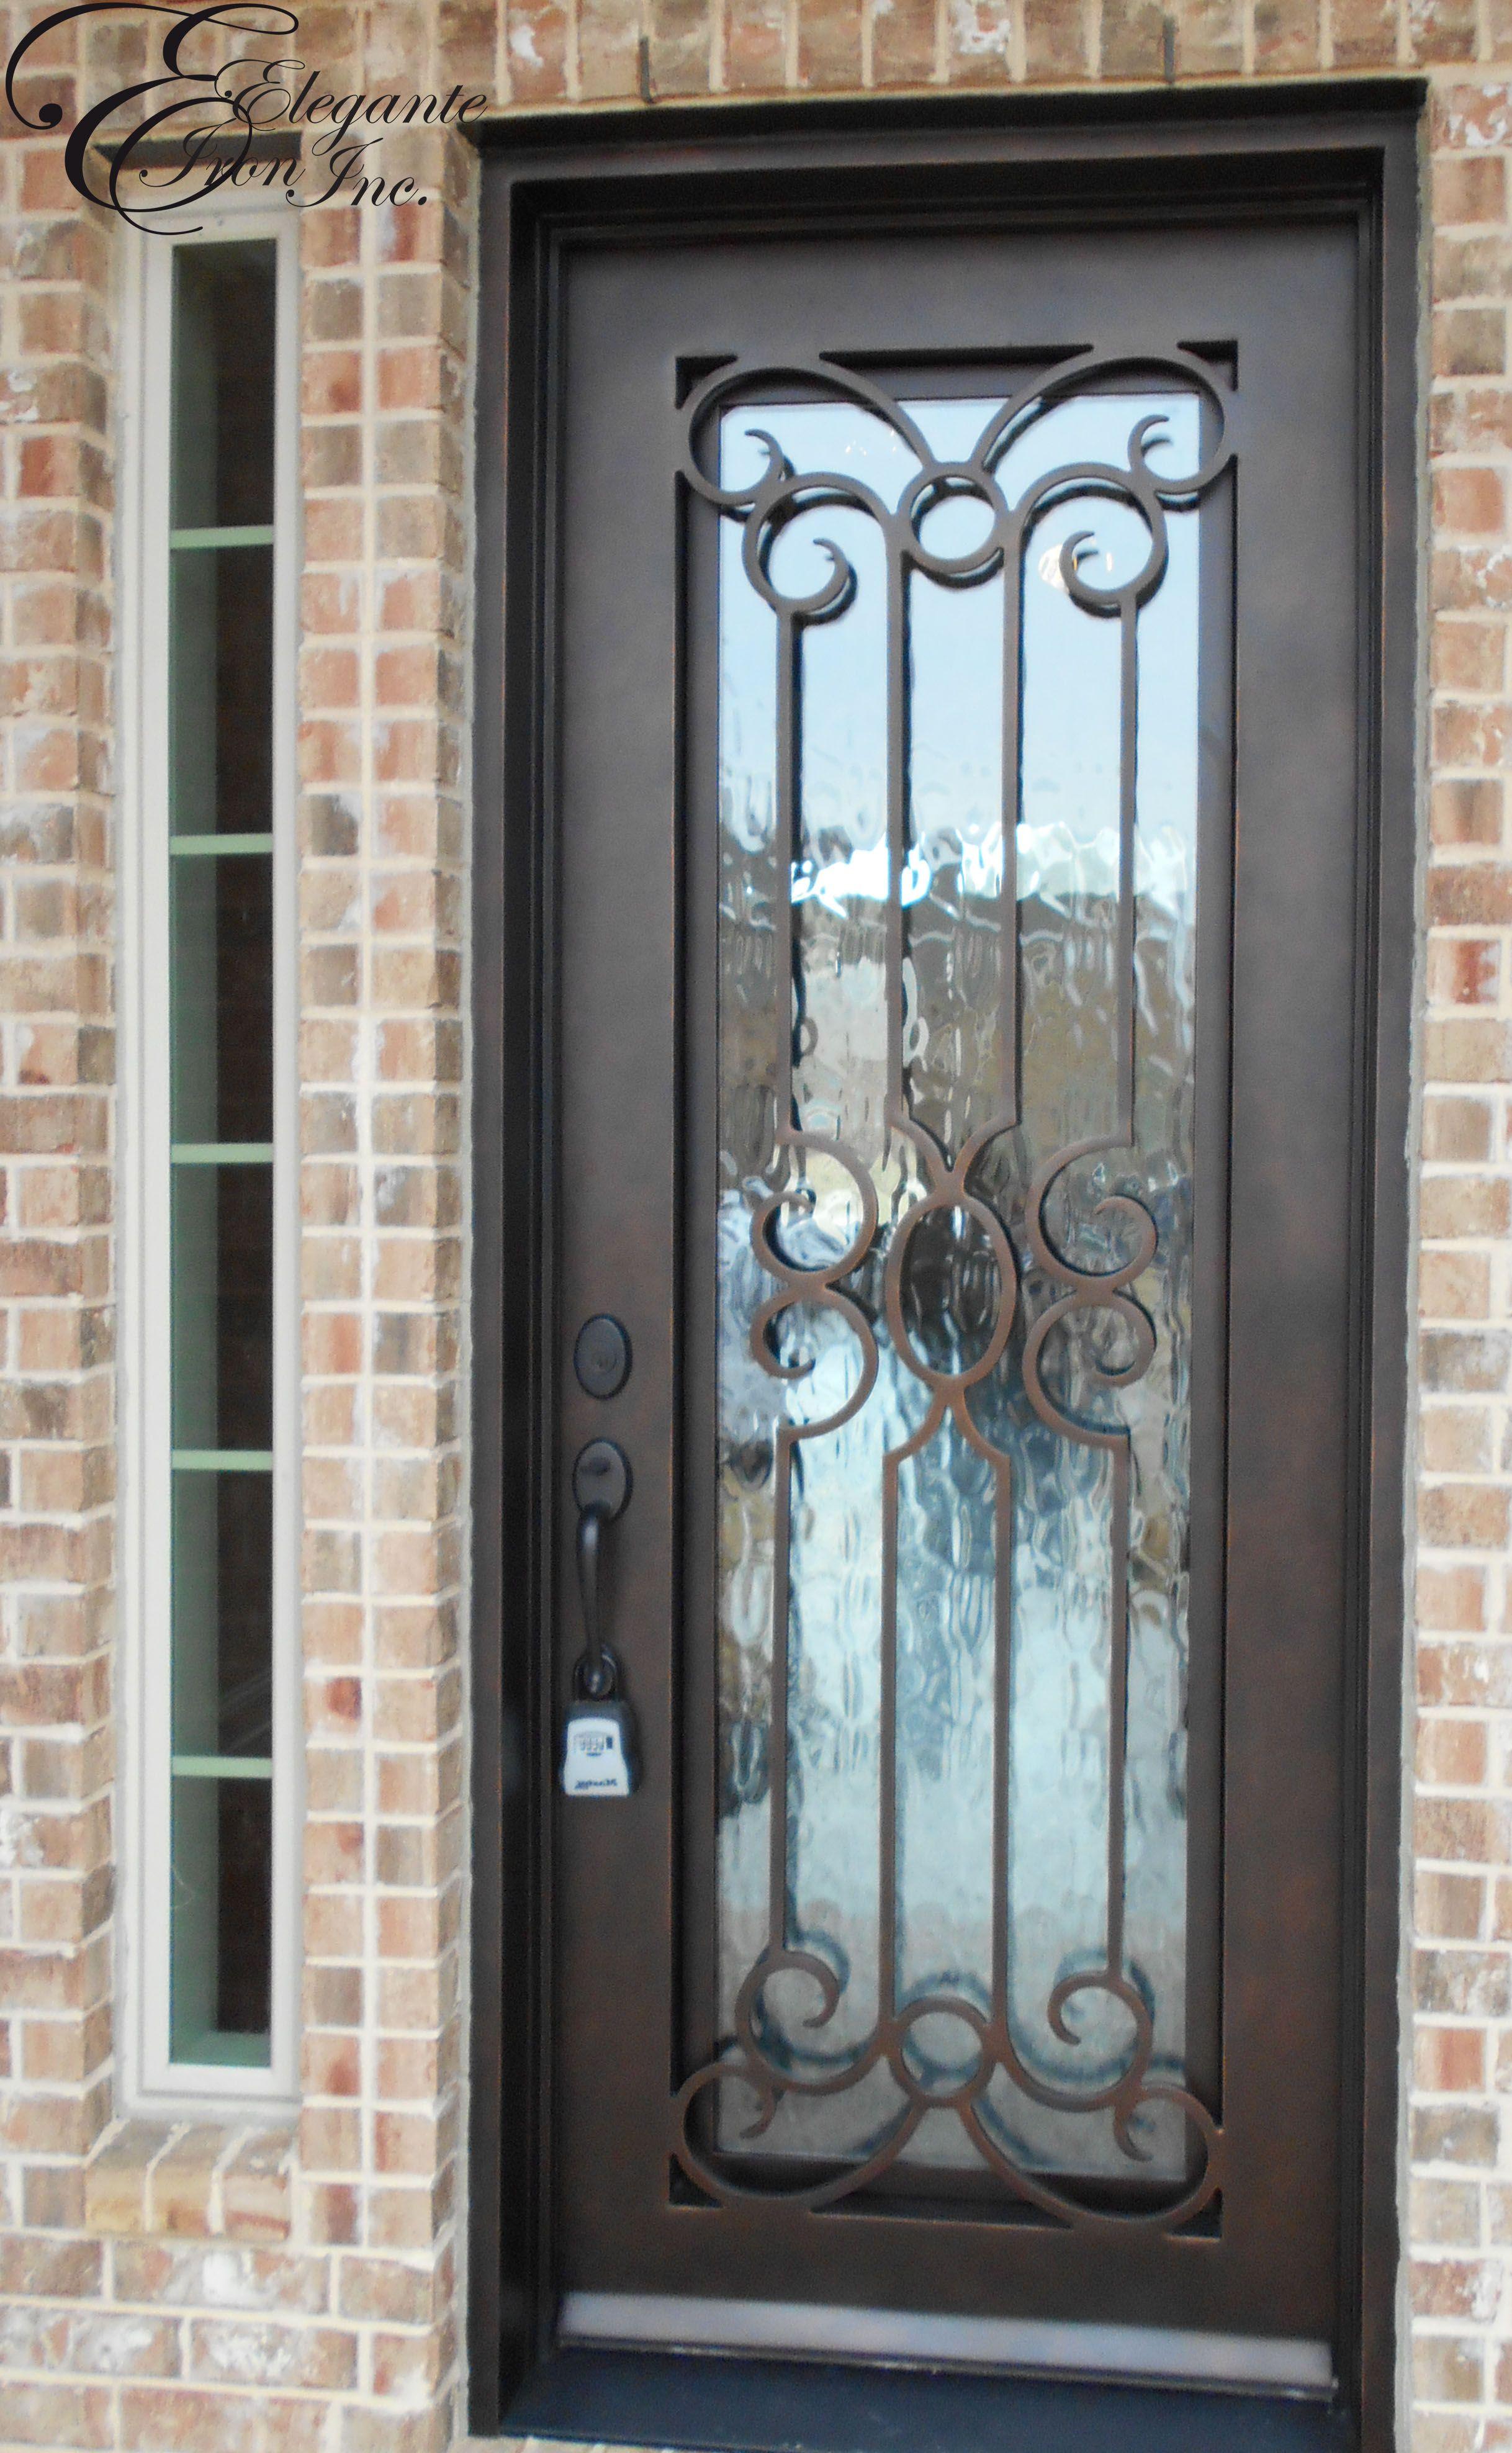 3952 #7D624E Custom Iron Door. Single Doors Pinterest image Iron Entrance Doors 38932436